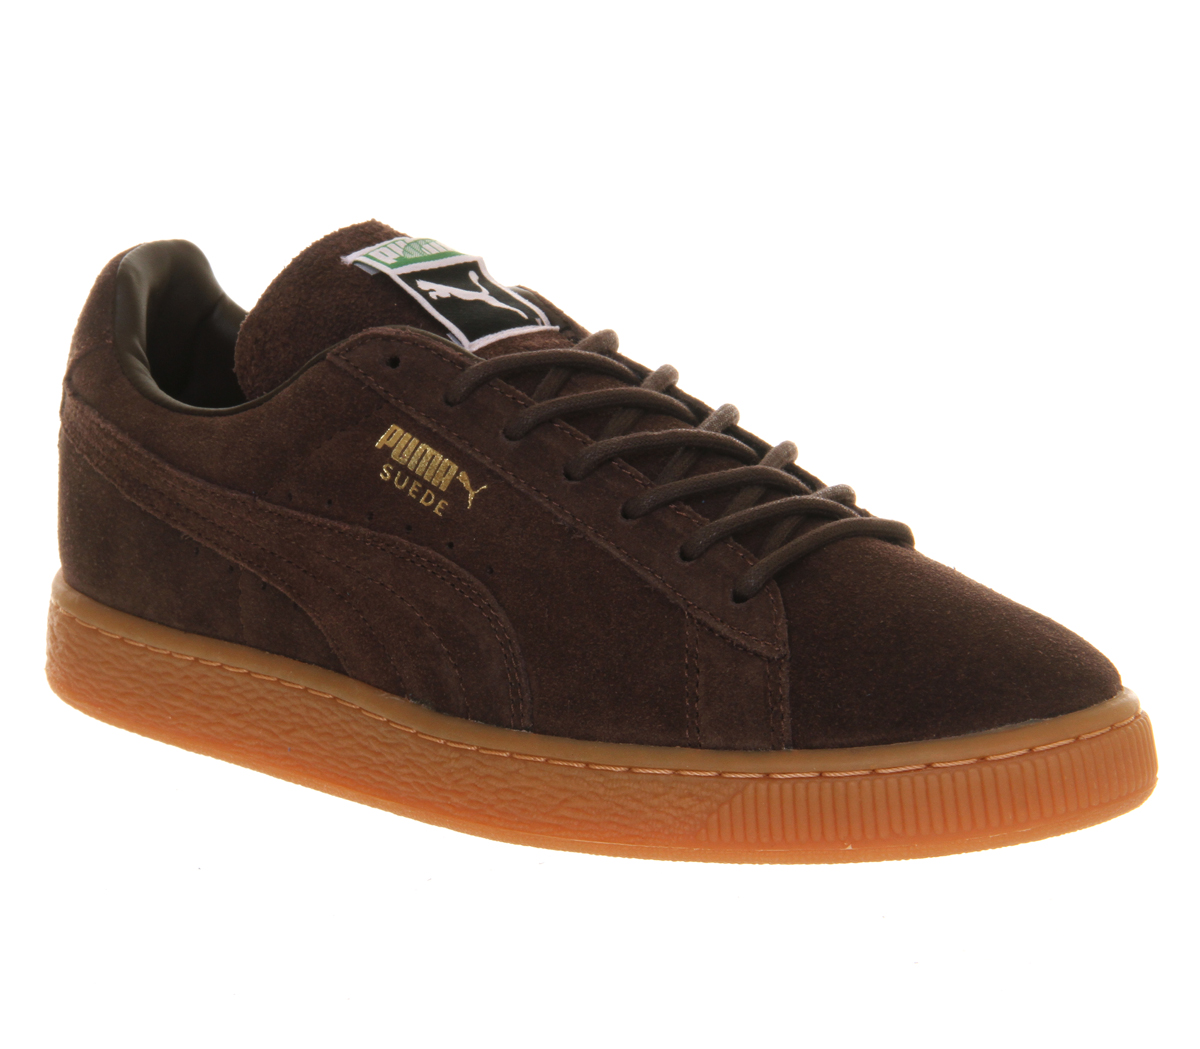 Unisex-Puma-Suede-Classic-CHOCOLATE-GUM-Trainers-Shoes-VH2